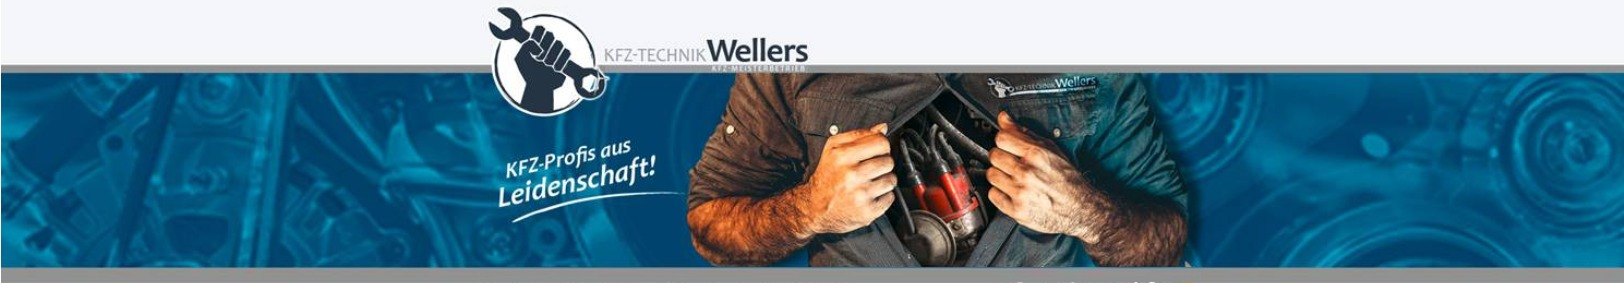 Kfz-Technik Wellers